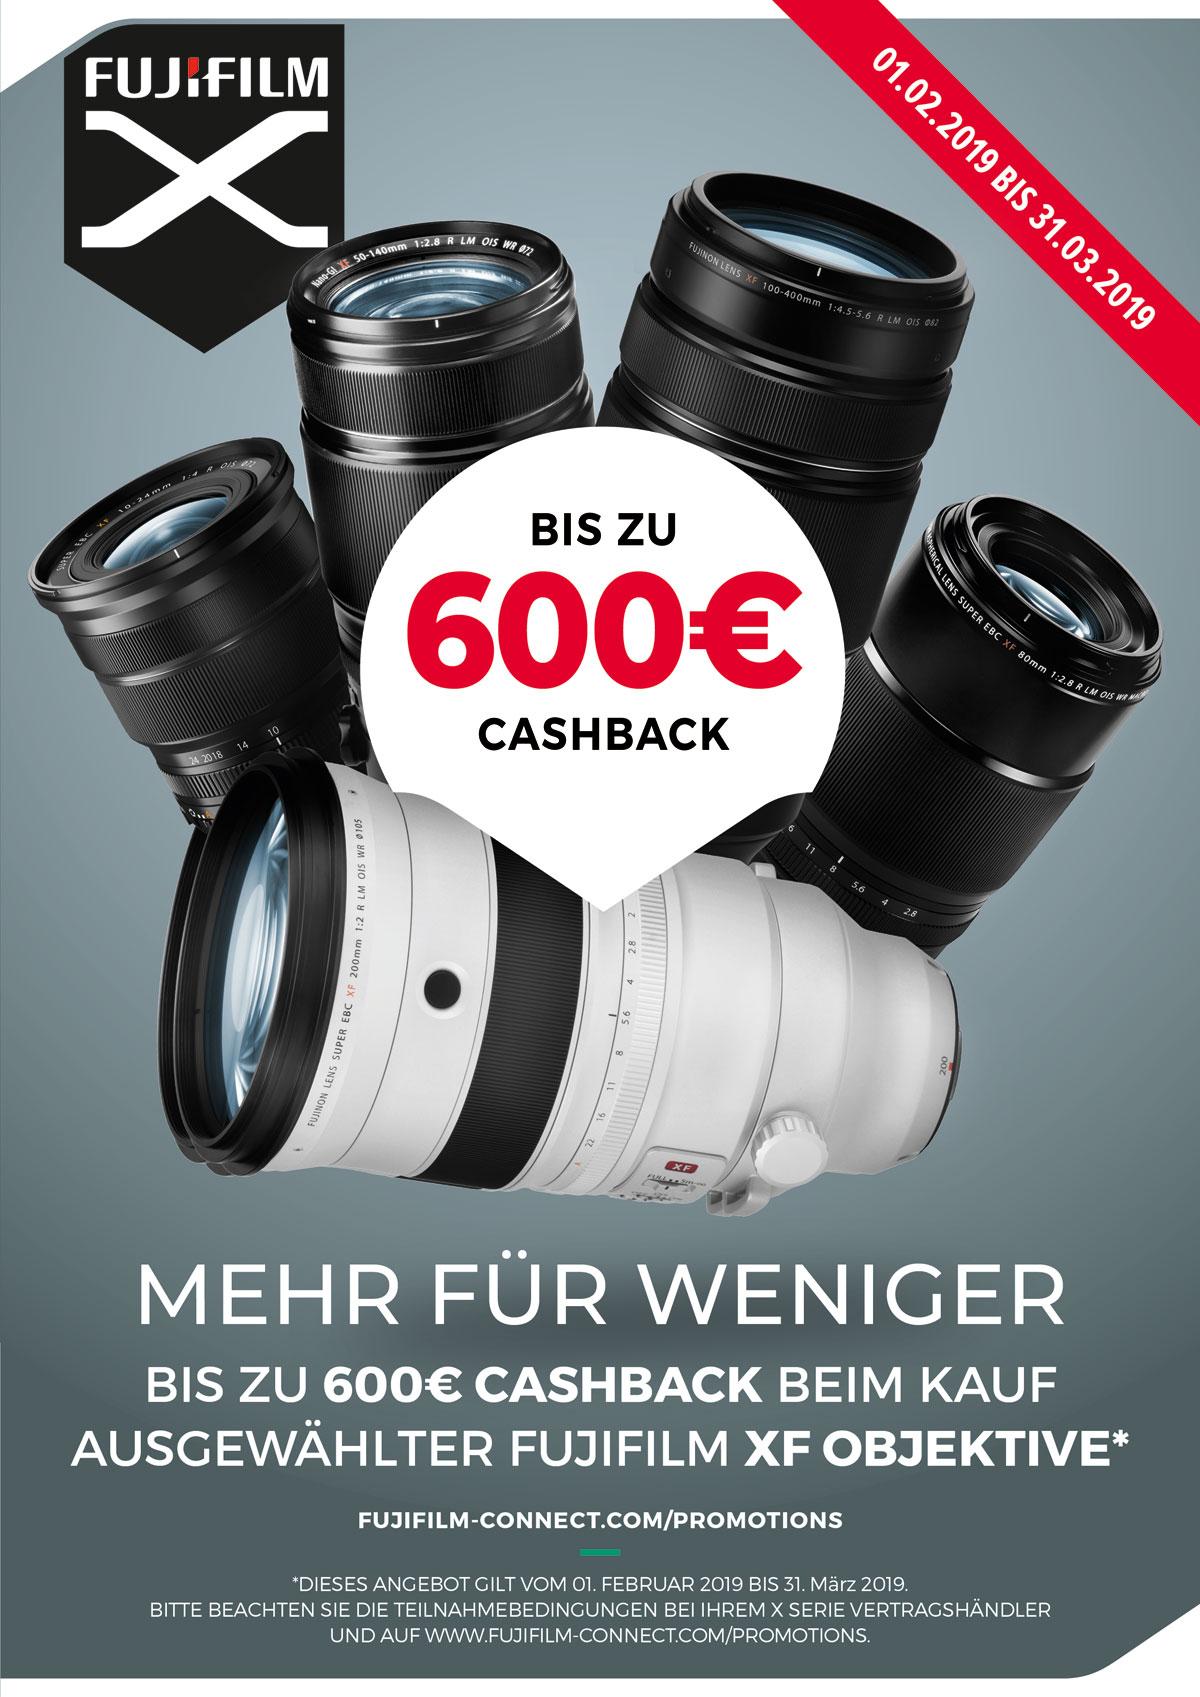 Fujifilm Objektiv Cashback